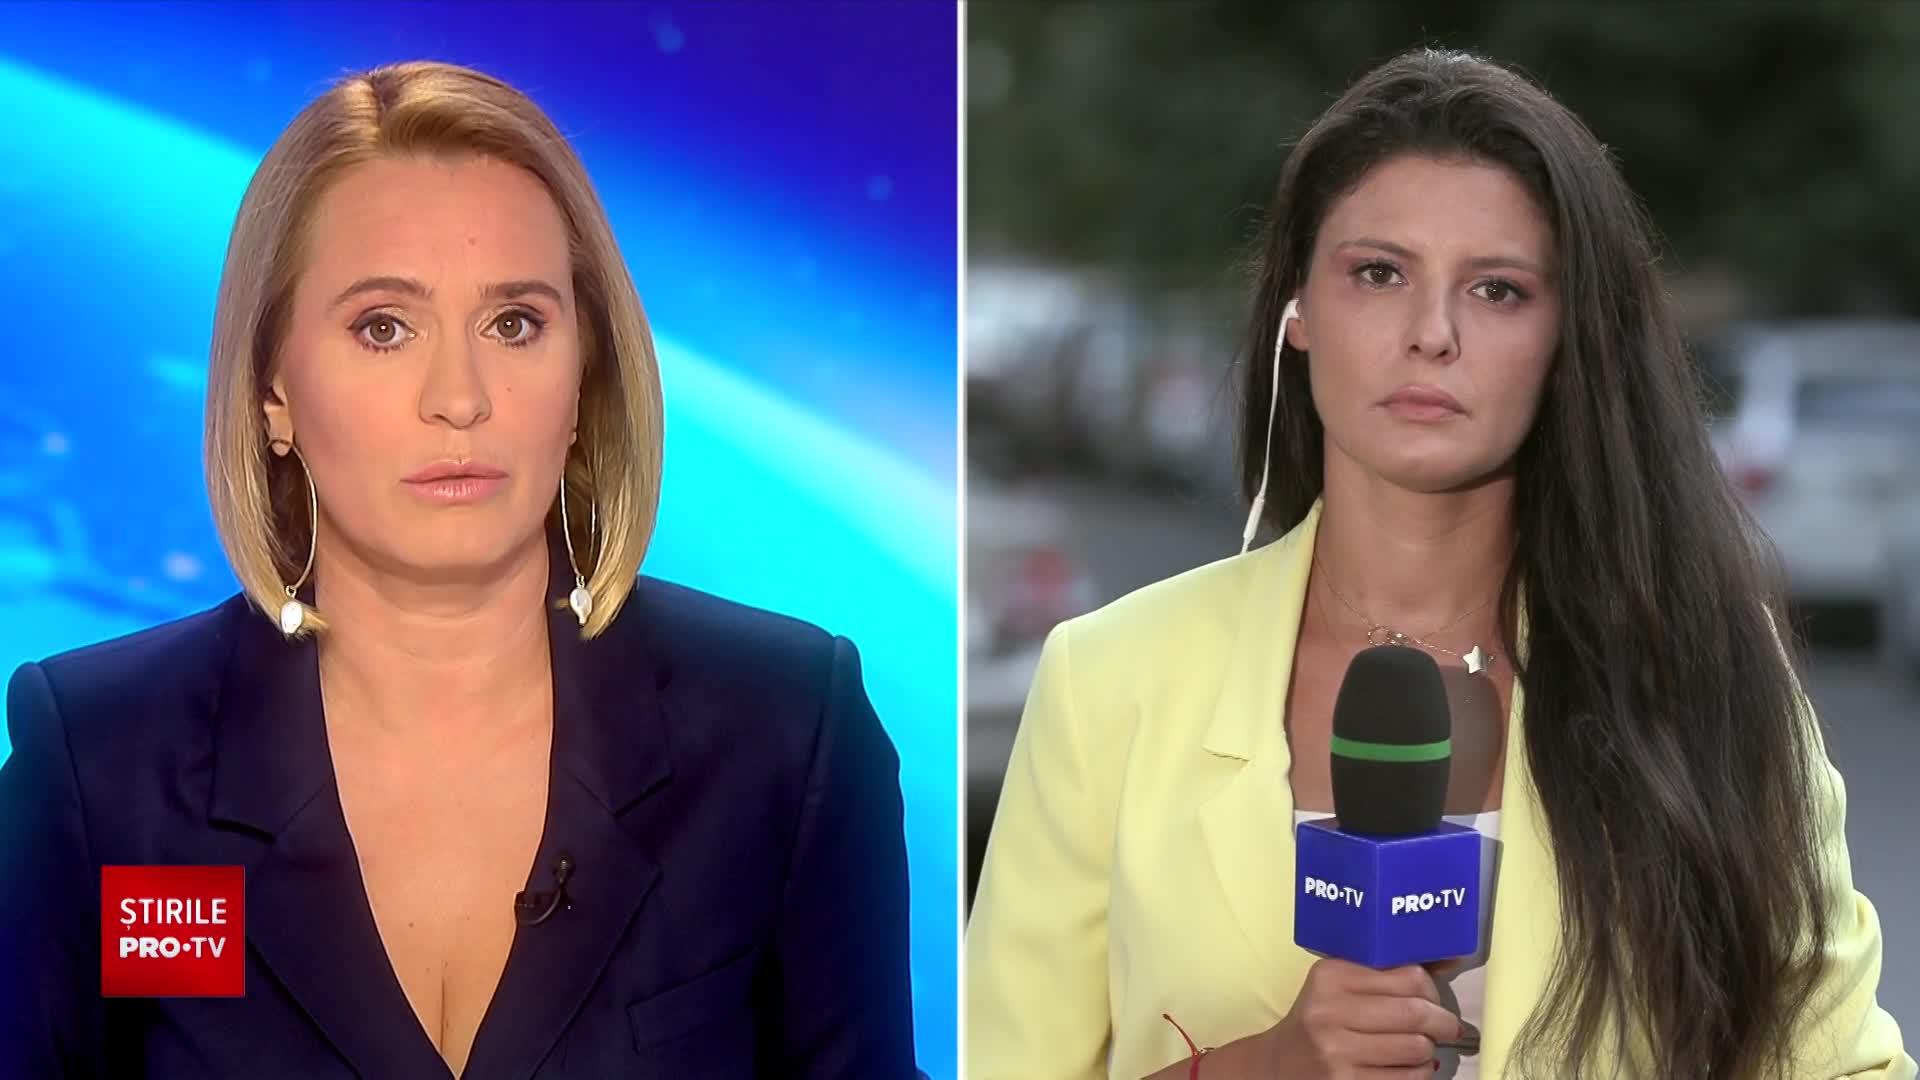 Stirile PRO TV # 19.00 - 31 August 2020